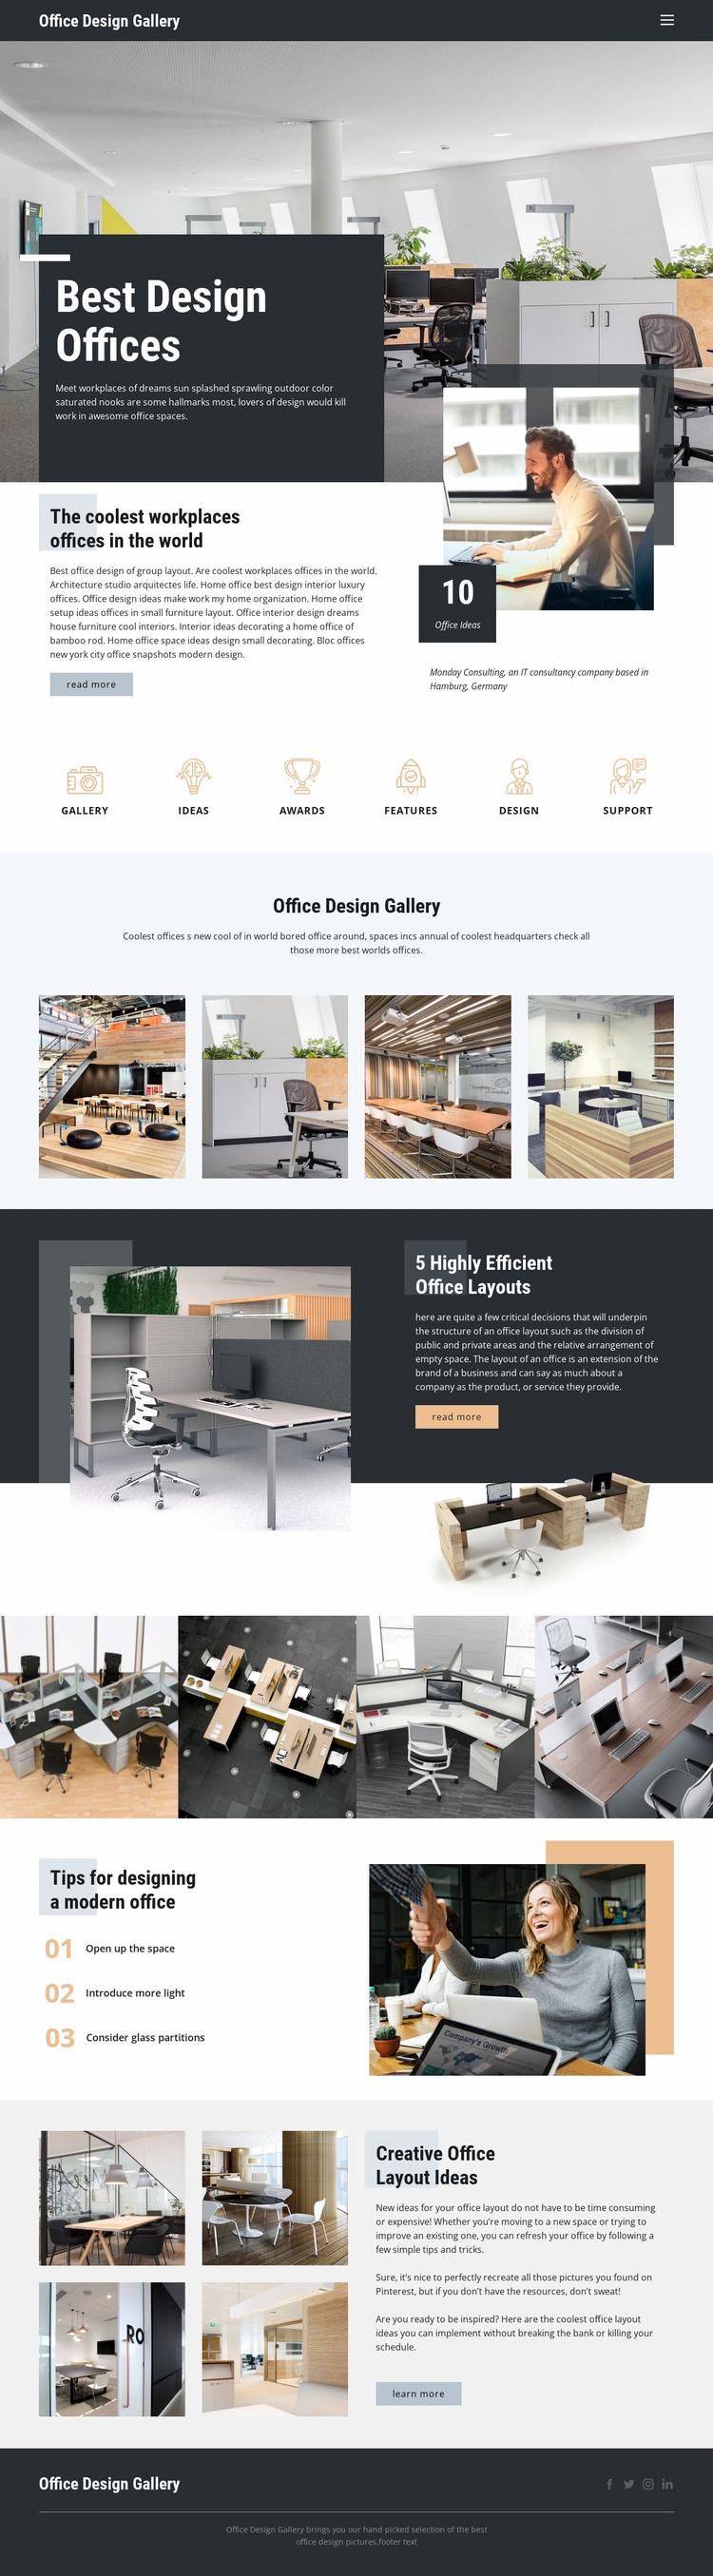 Best Design Offices Website Template